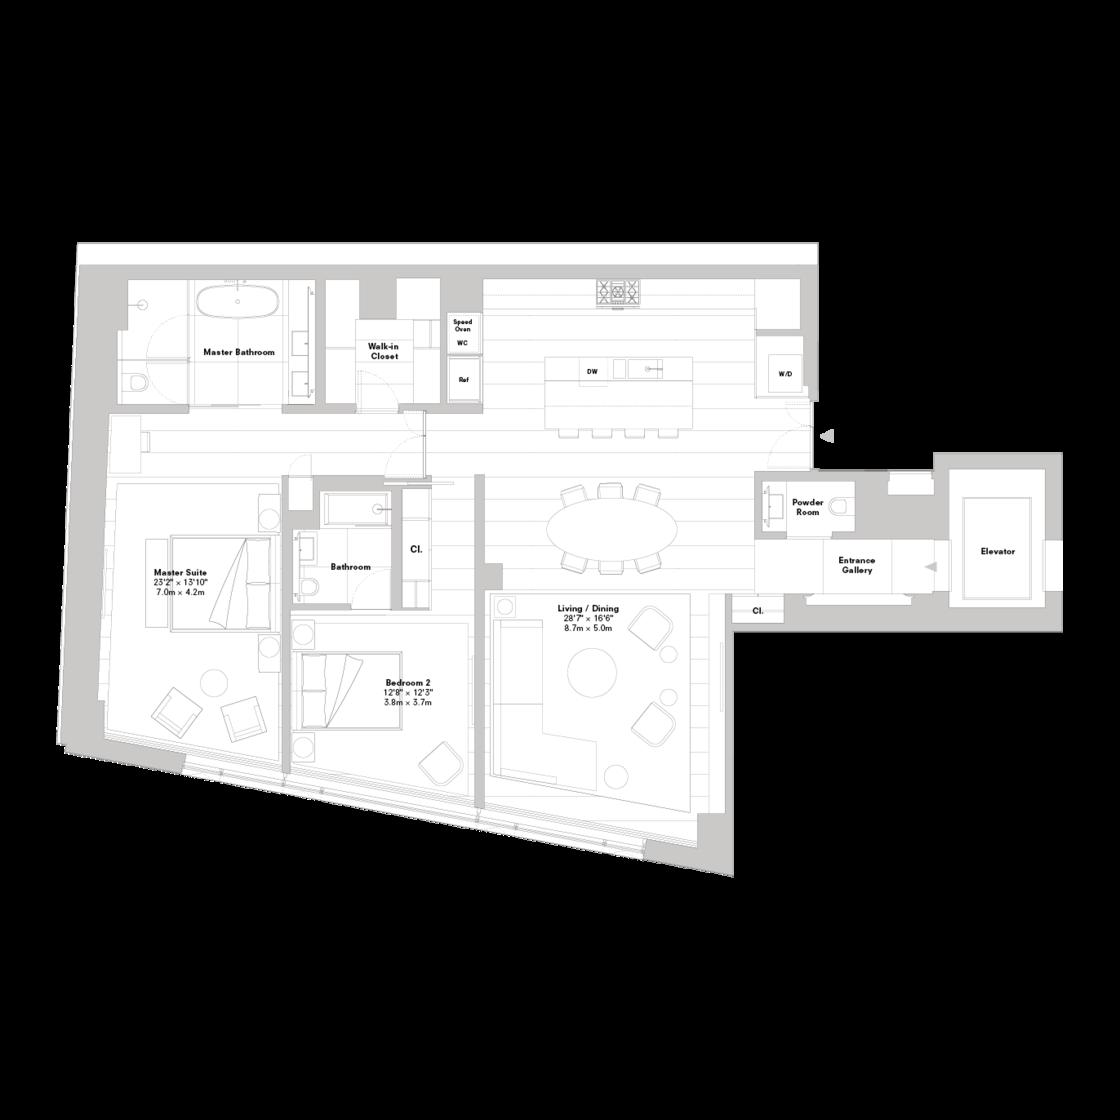 152 elizabeth availability for 111 elizabeth street floor plan